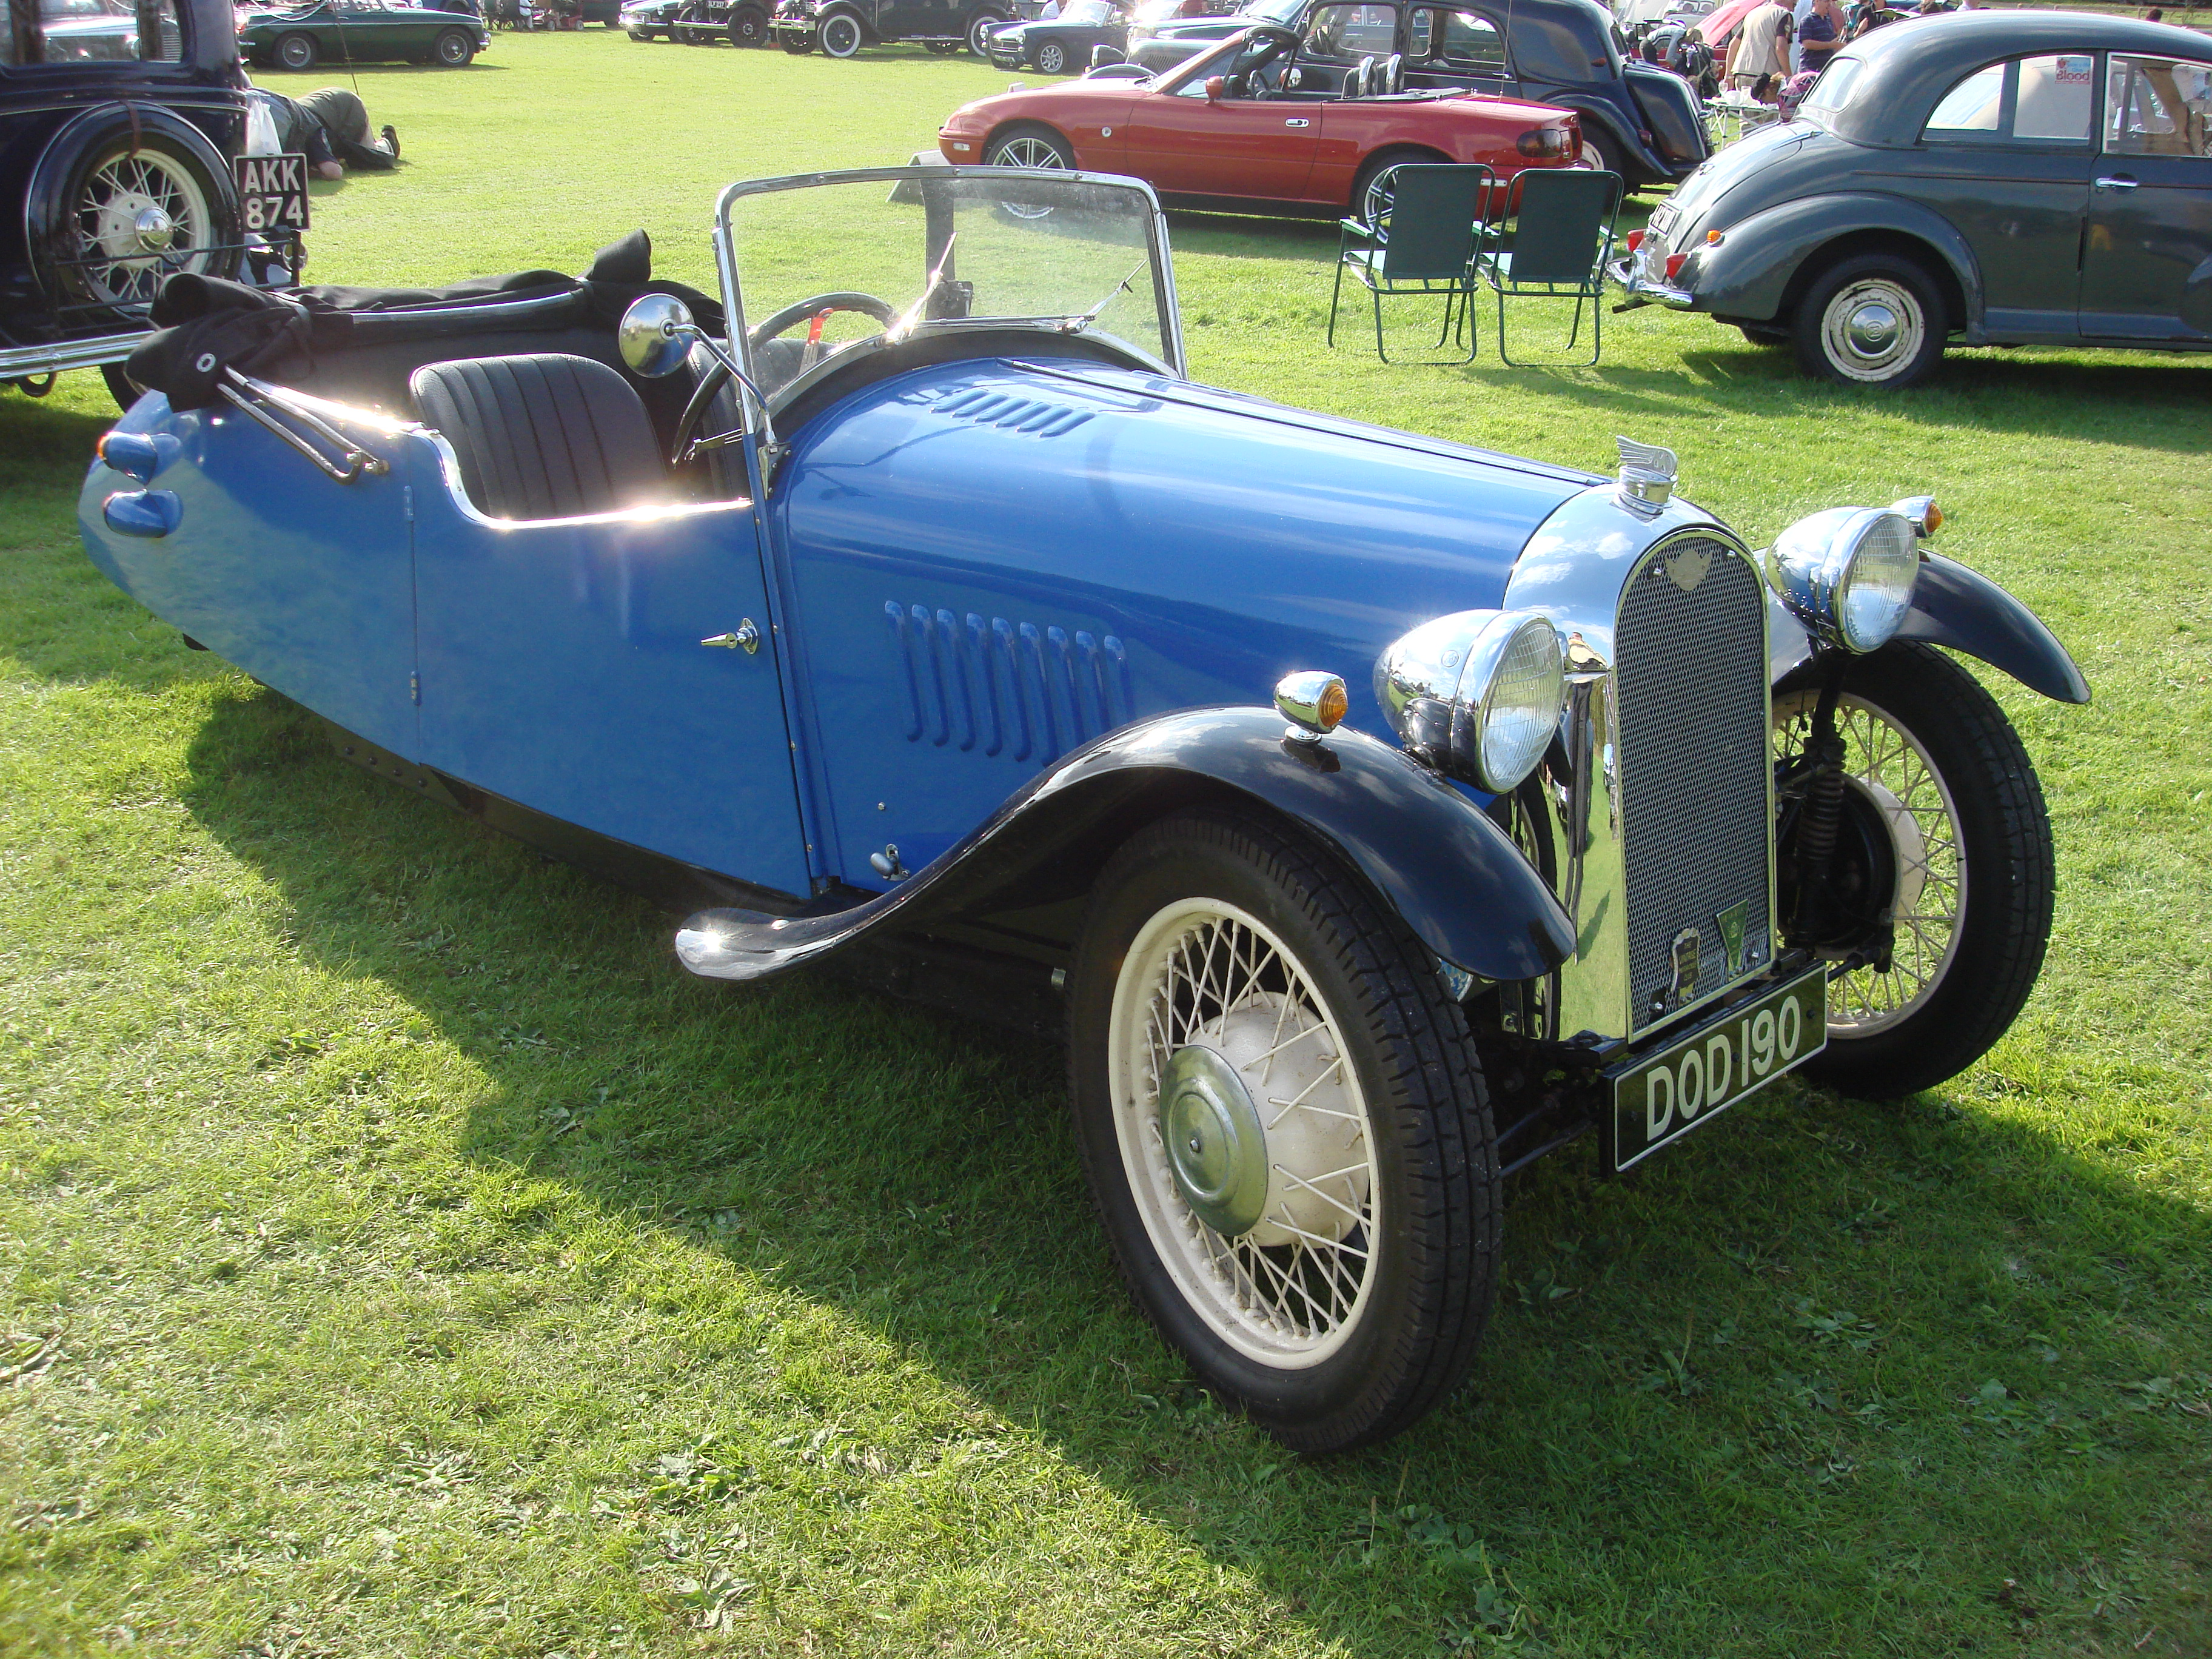 Vintage Three Wheel Cars For Sale